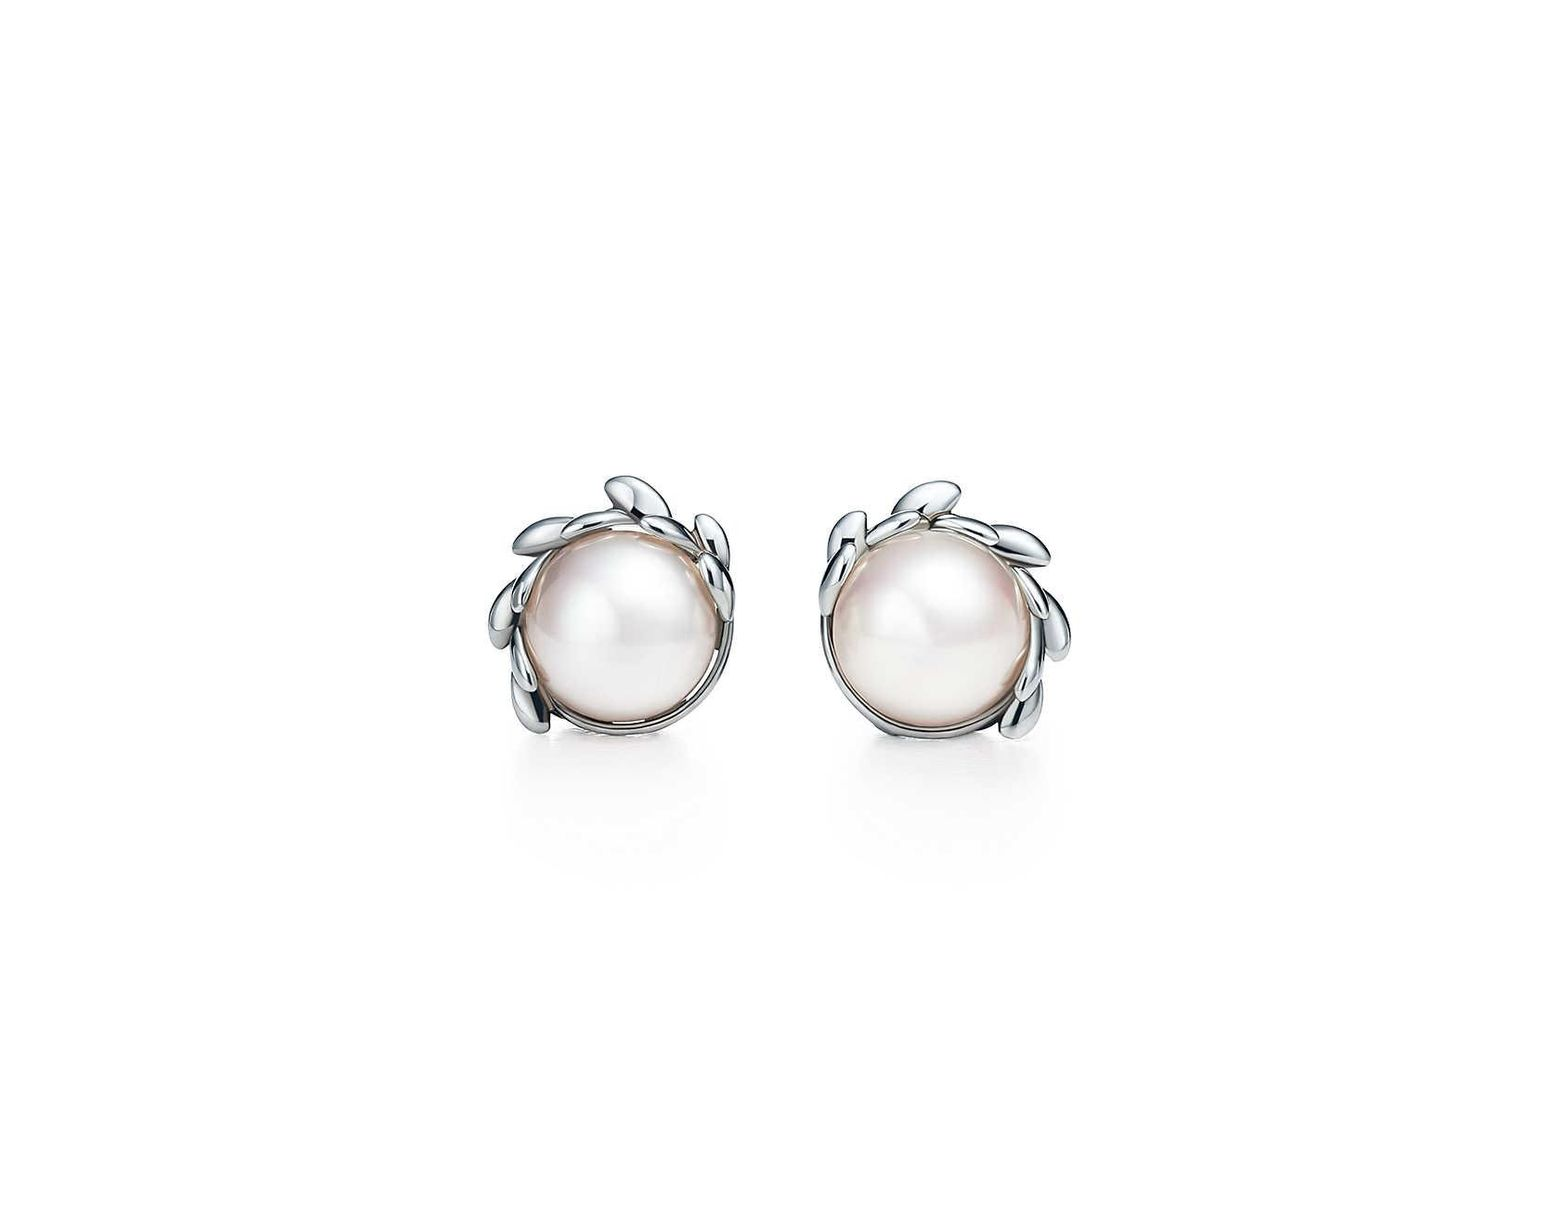 2112b7653 Tiffany & Co. Olive Leaf Pearl Earrings in Green - Lyst